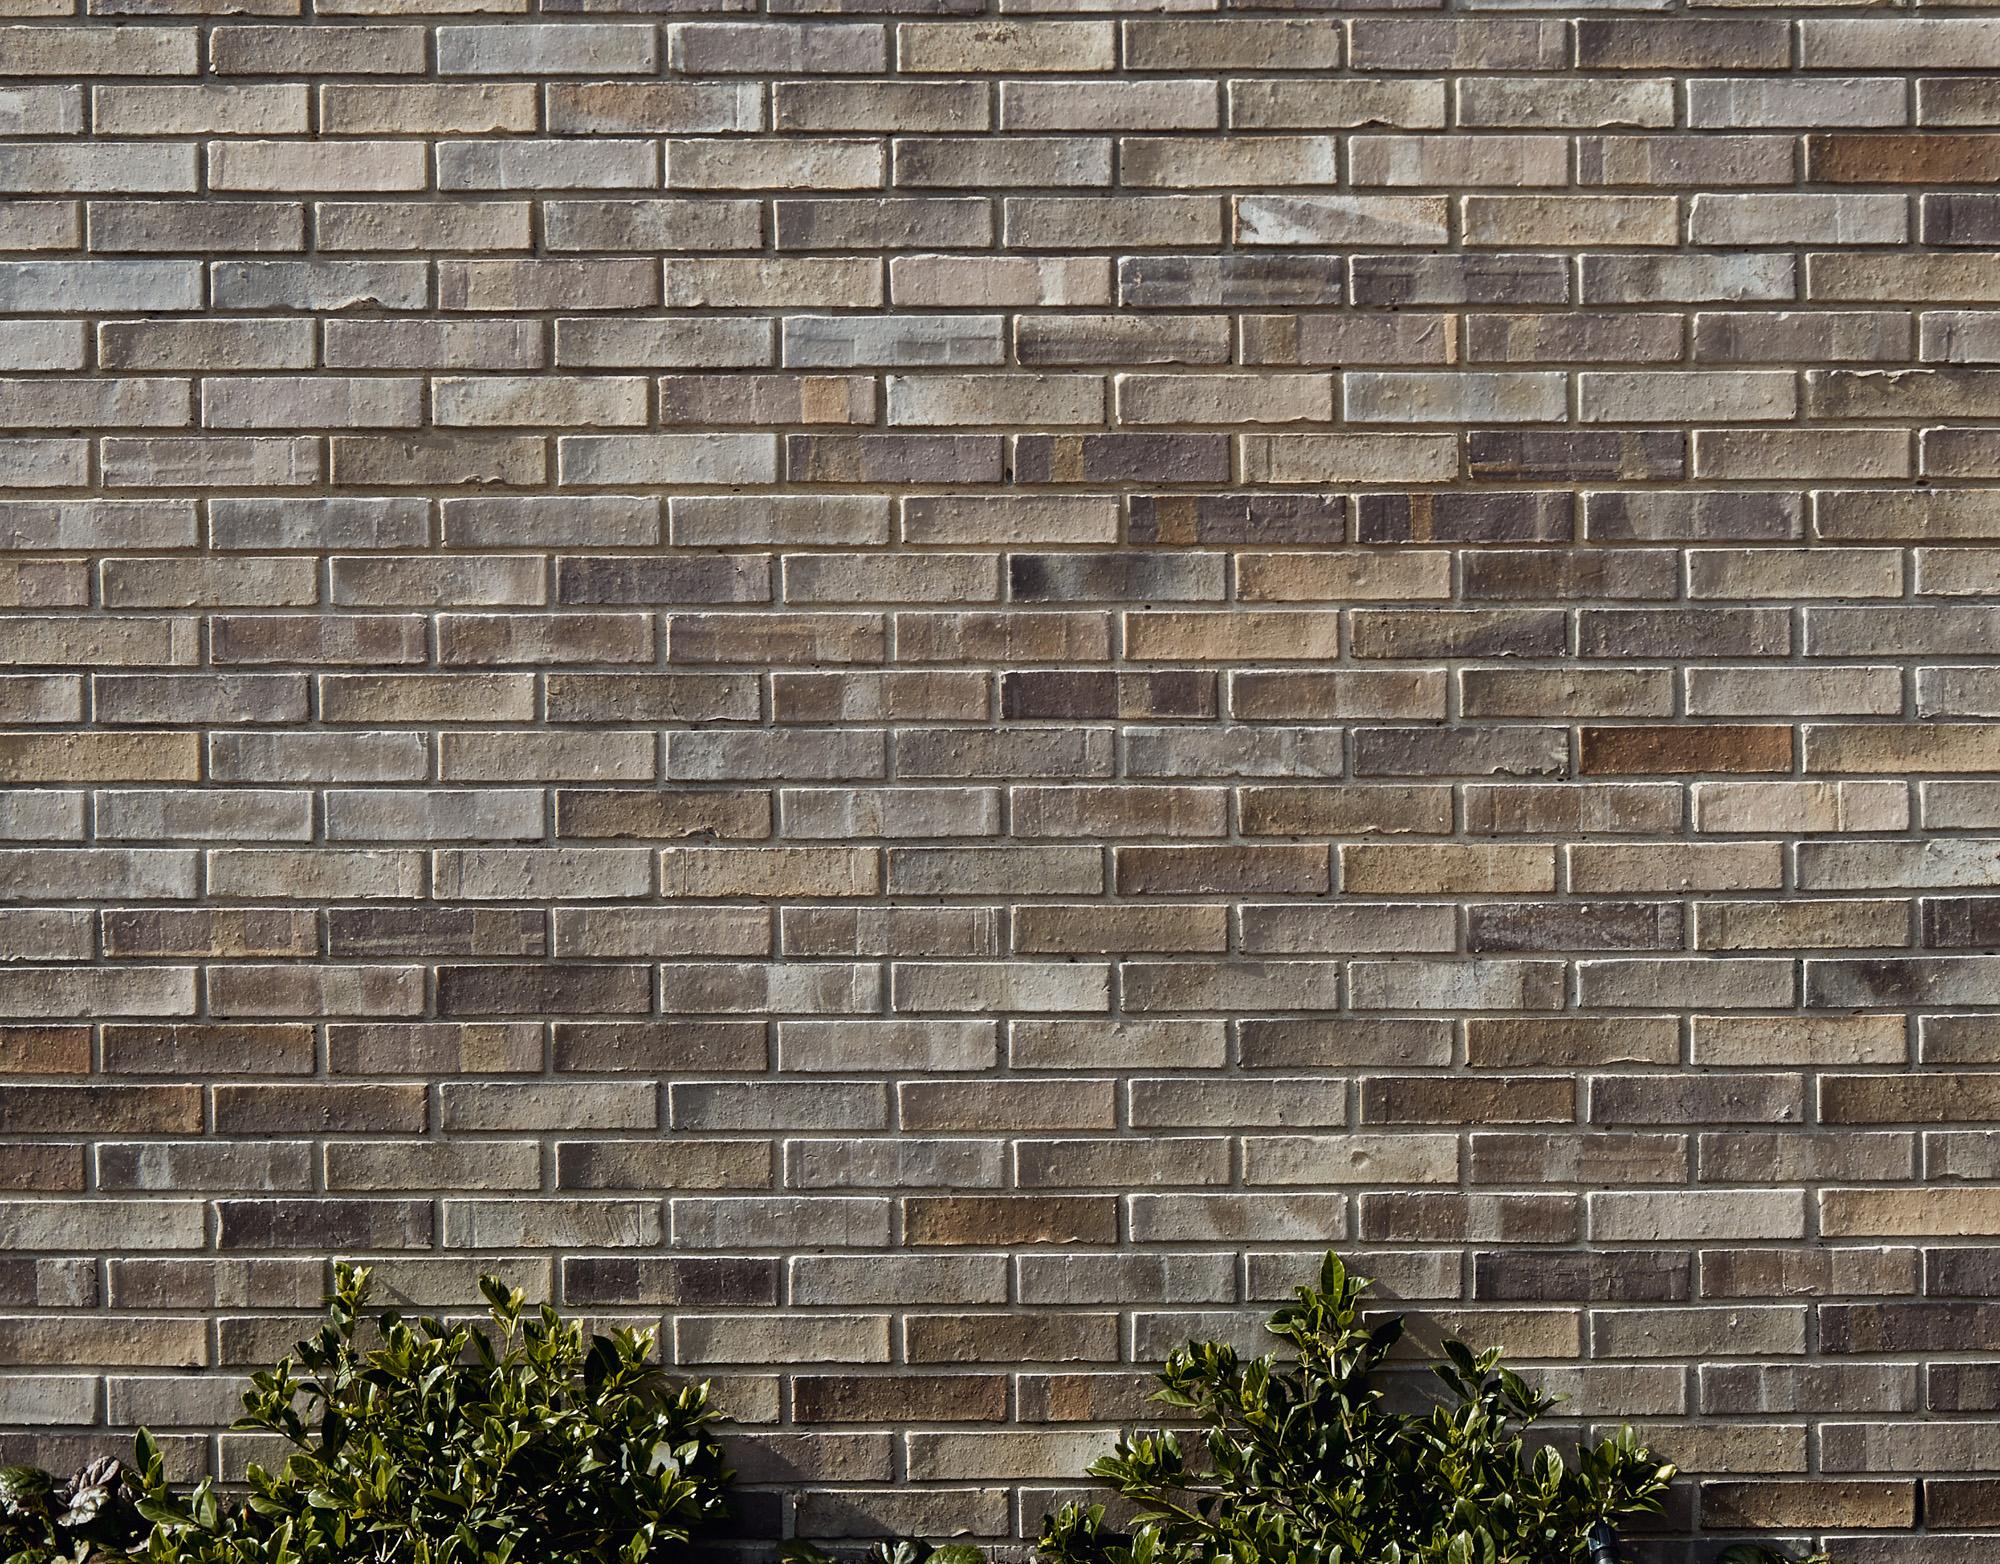 181206 Krause Bricks 0341 crop.jpg